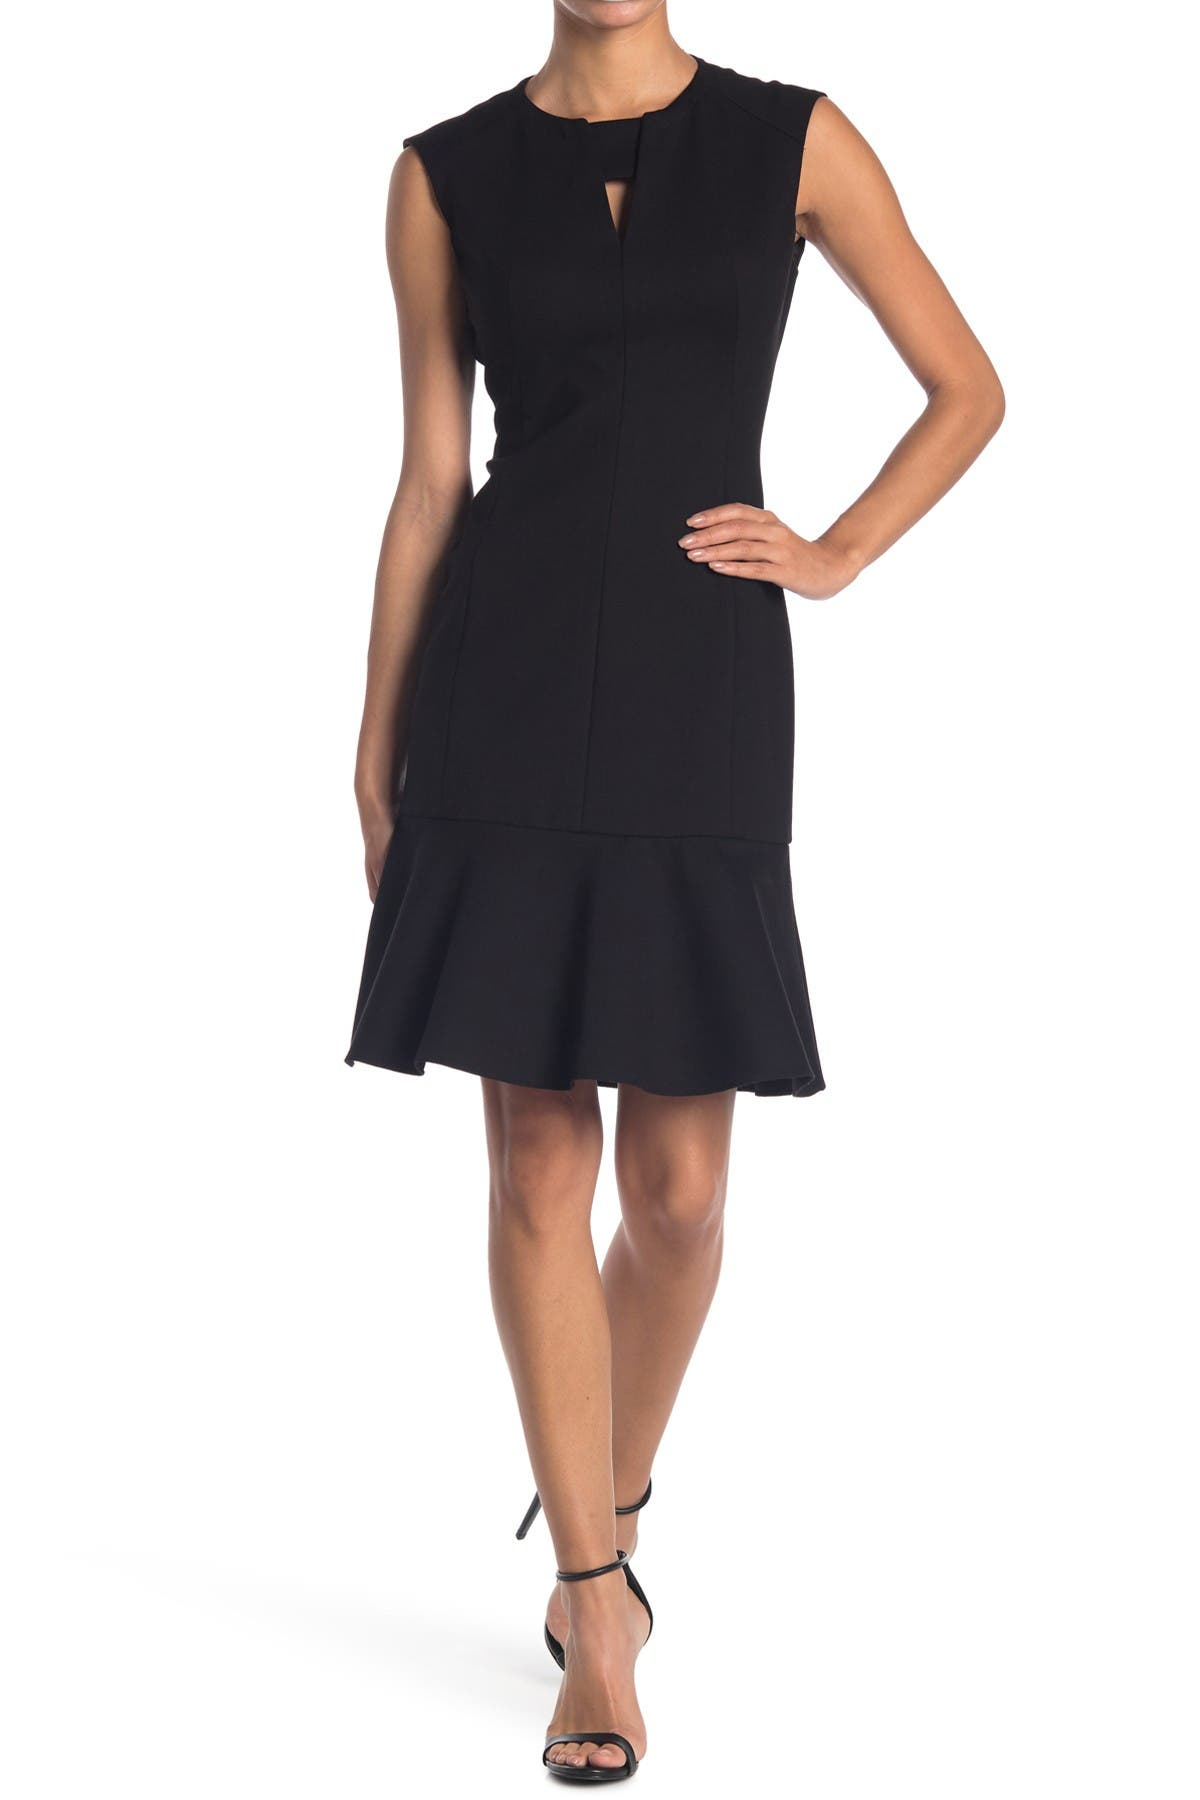 Image of Elie Tahari Lyla Peplum Hem Cutout Dress